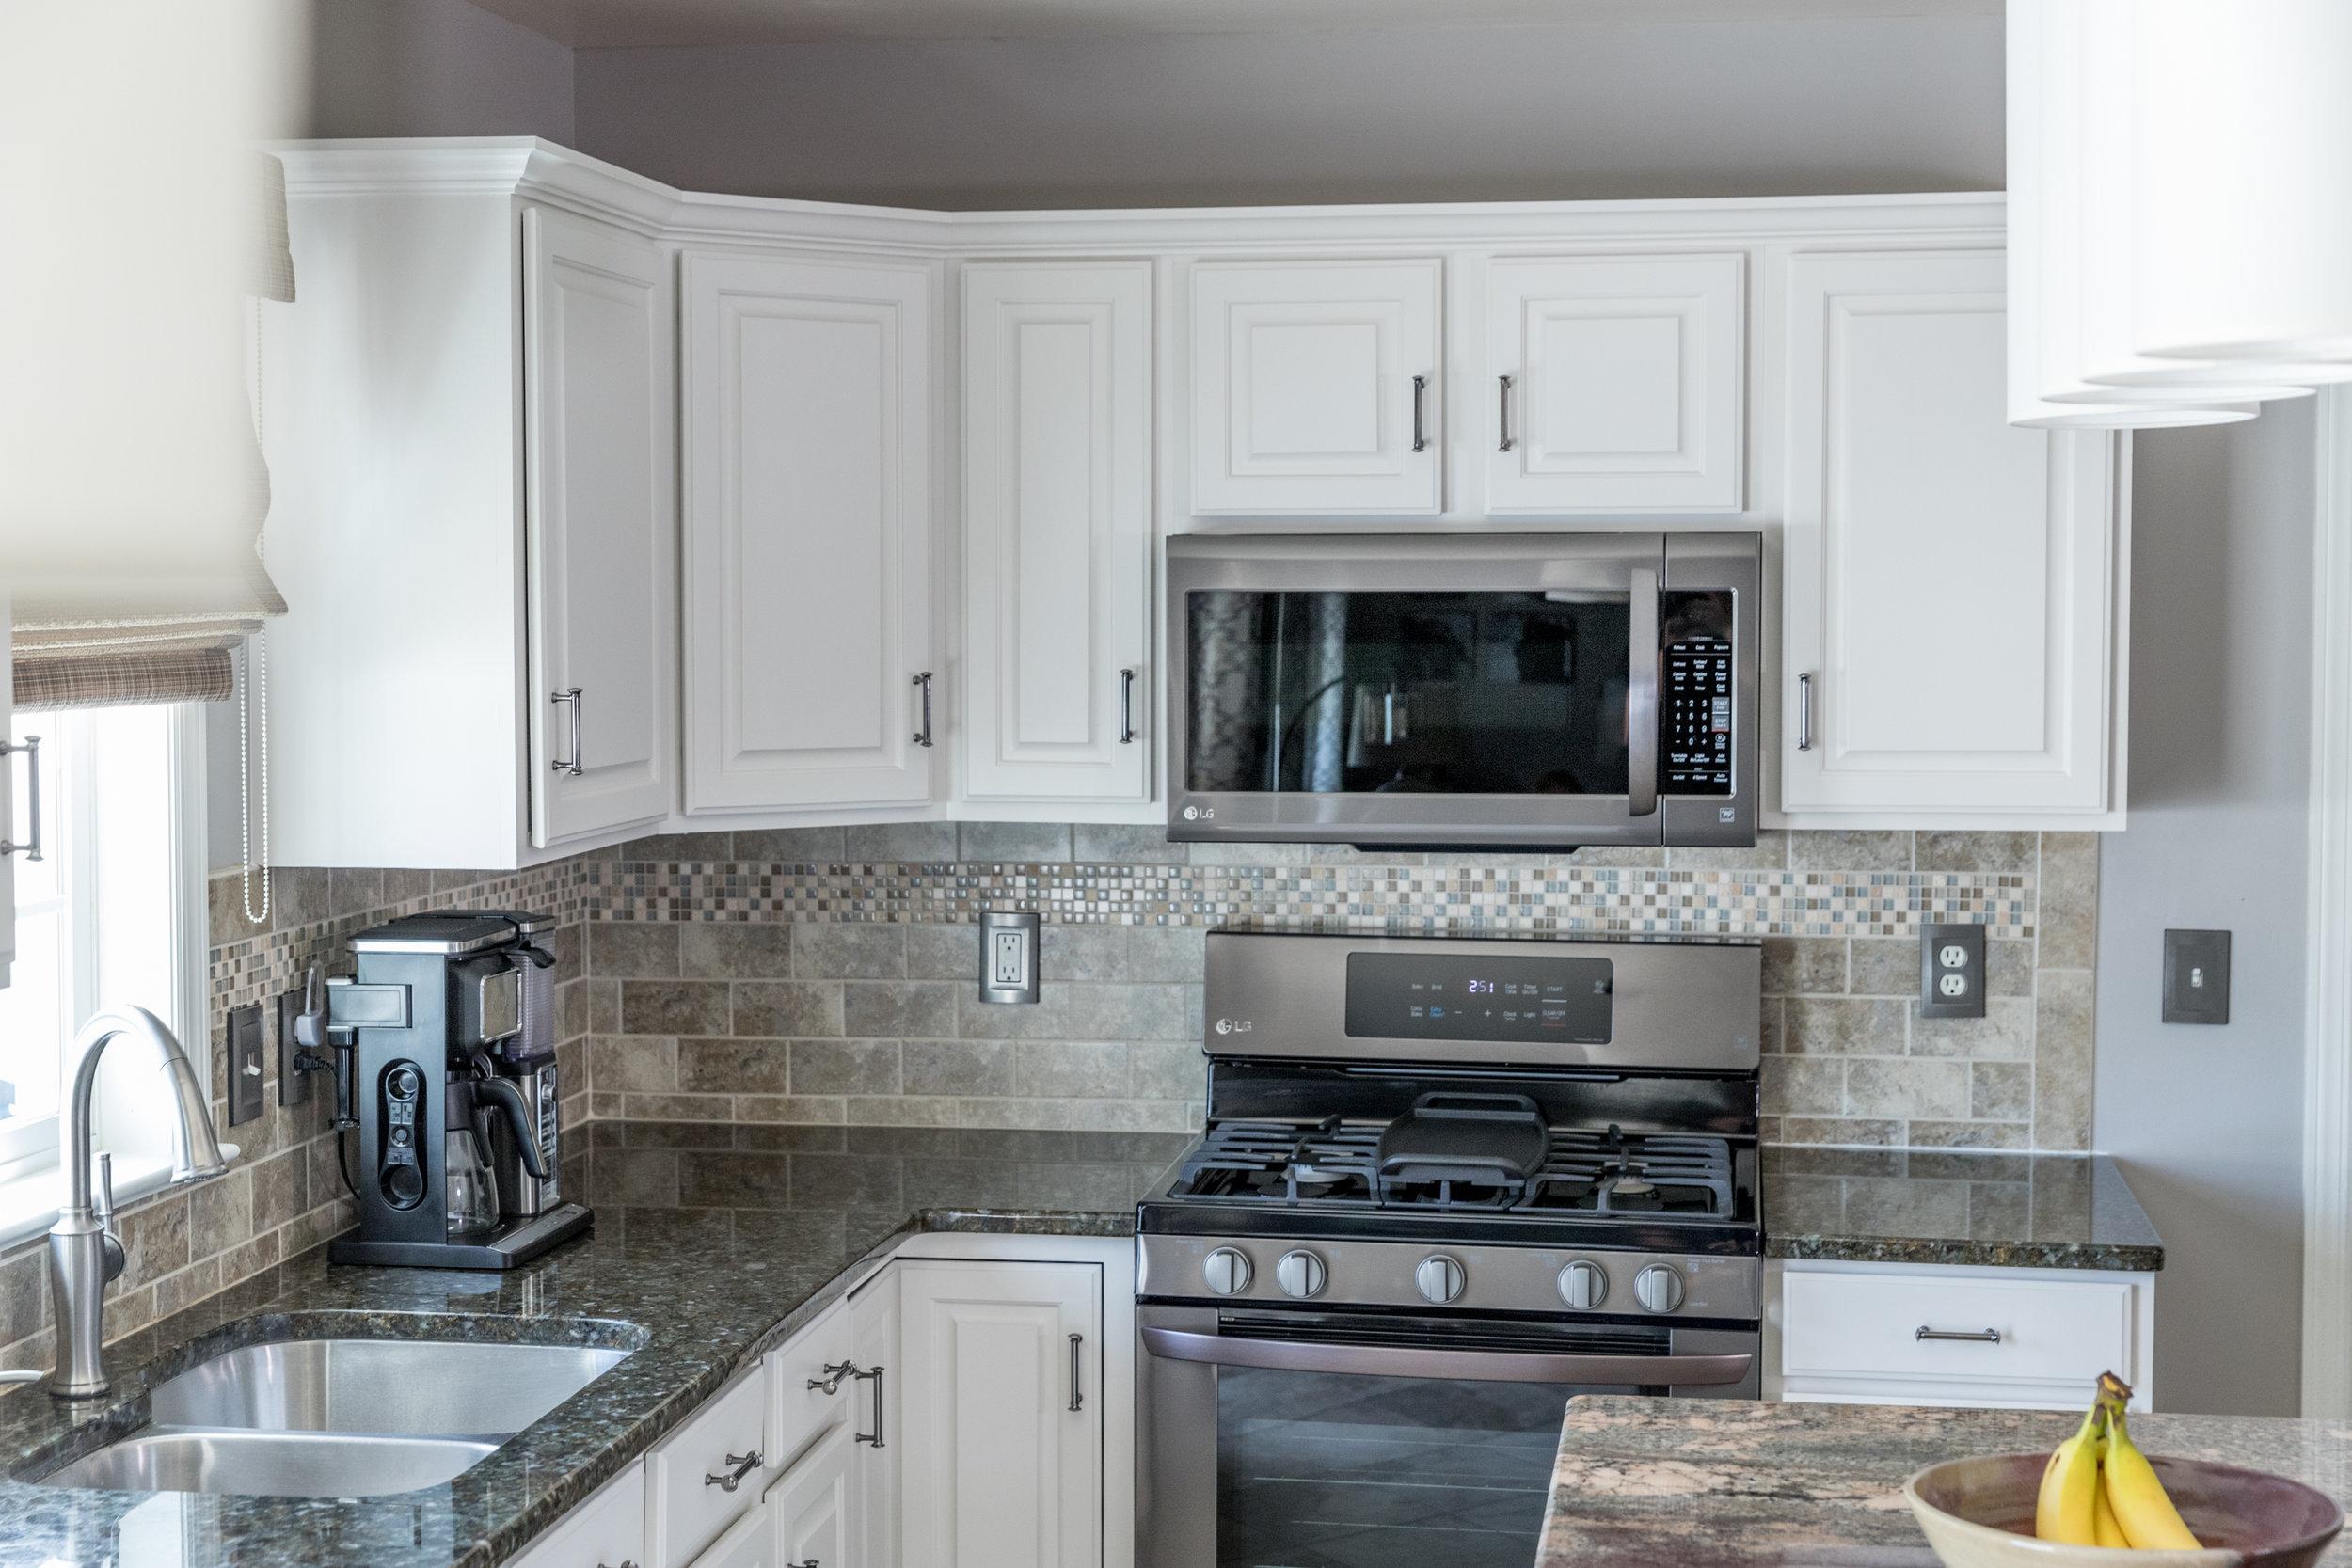 Kitchen Cabinet Coatings Testimonies — Lapp CabiCoatings